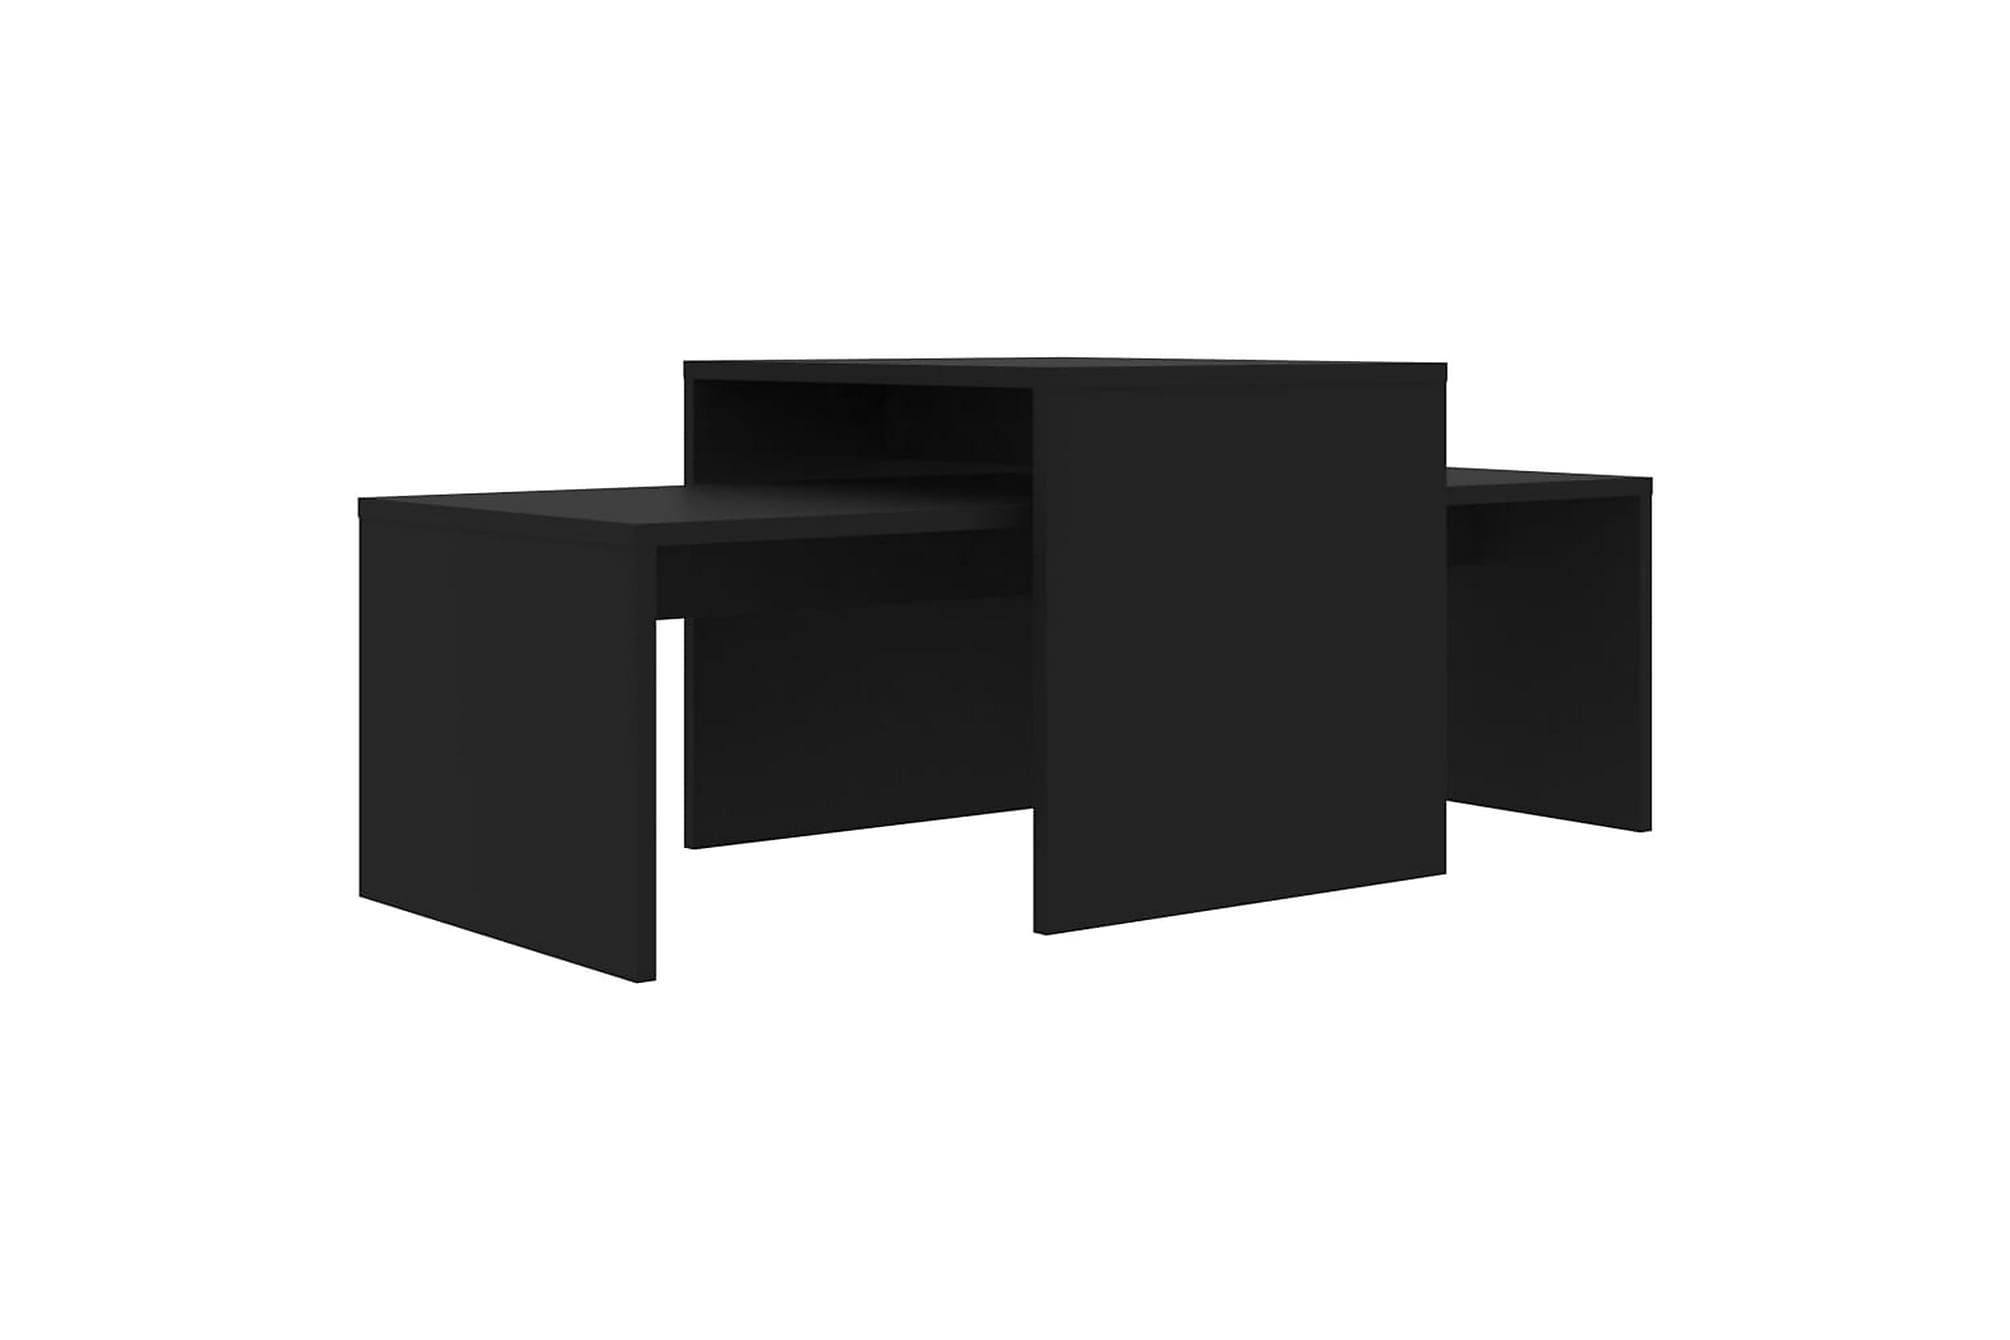 Soffbord set svart 100x48x40 cm spånskiva